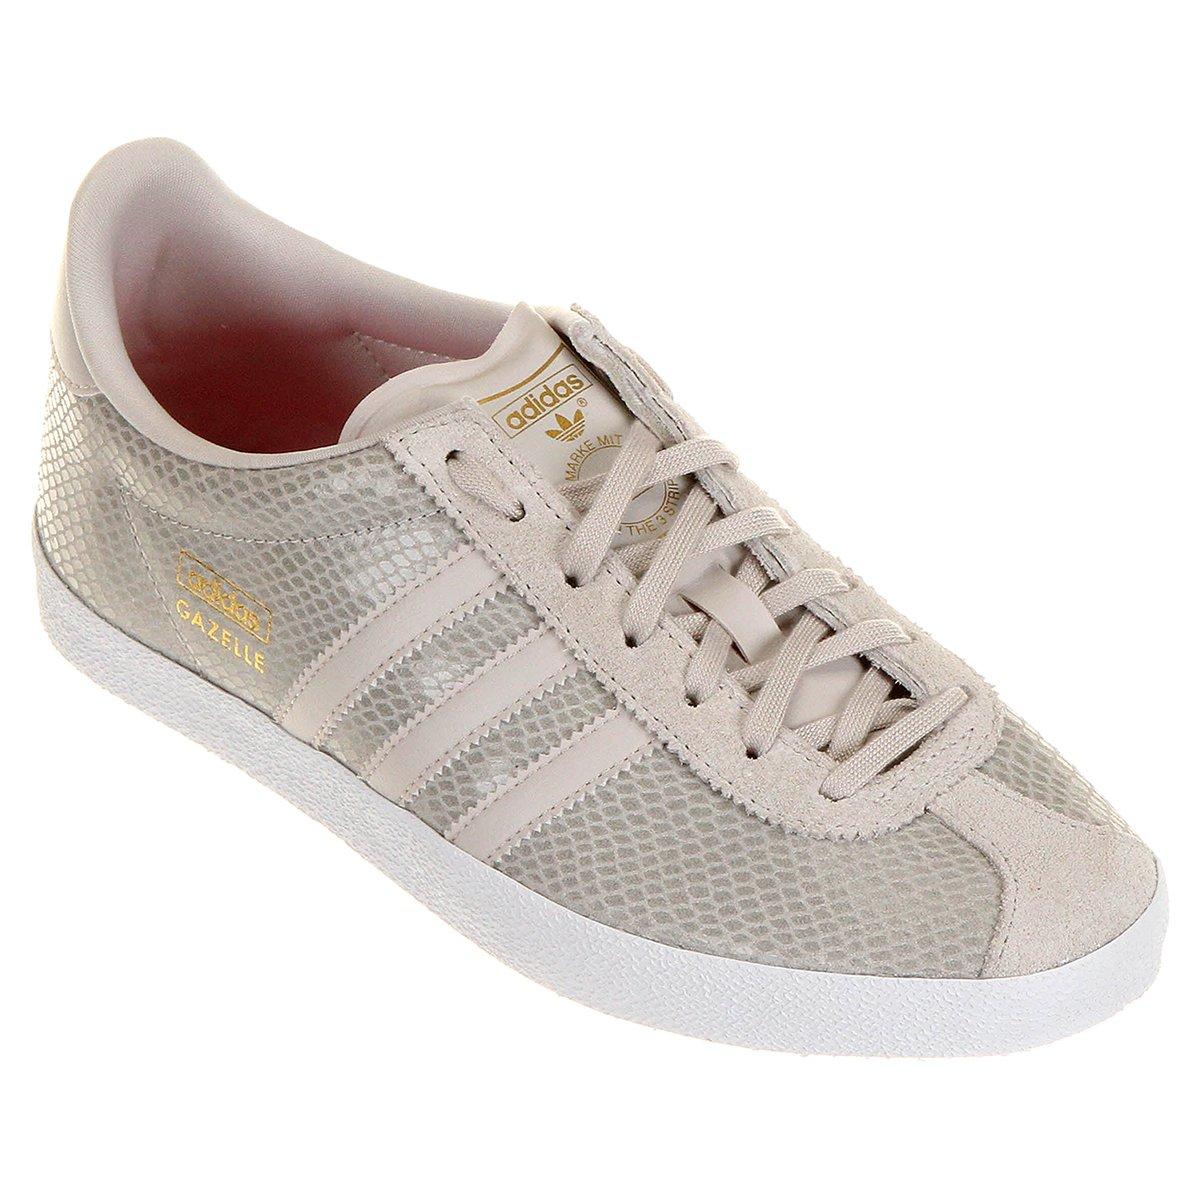 new arrival 9420e d47af Tênis Adidas Gazelle Og W - Compre Agora  Netshoes